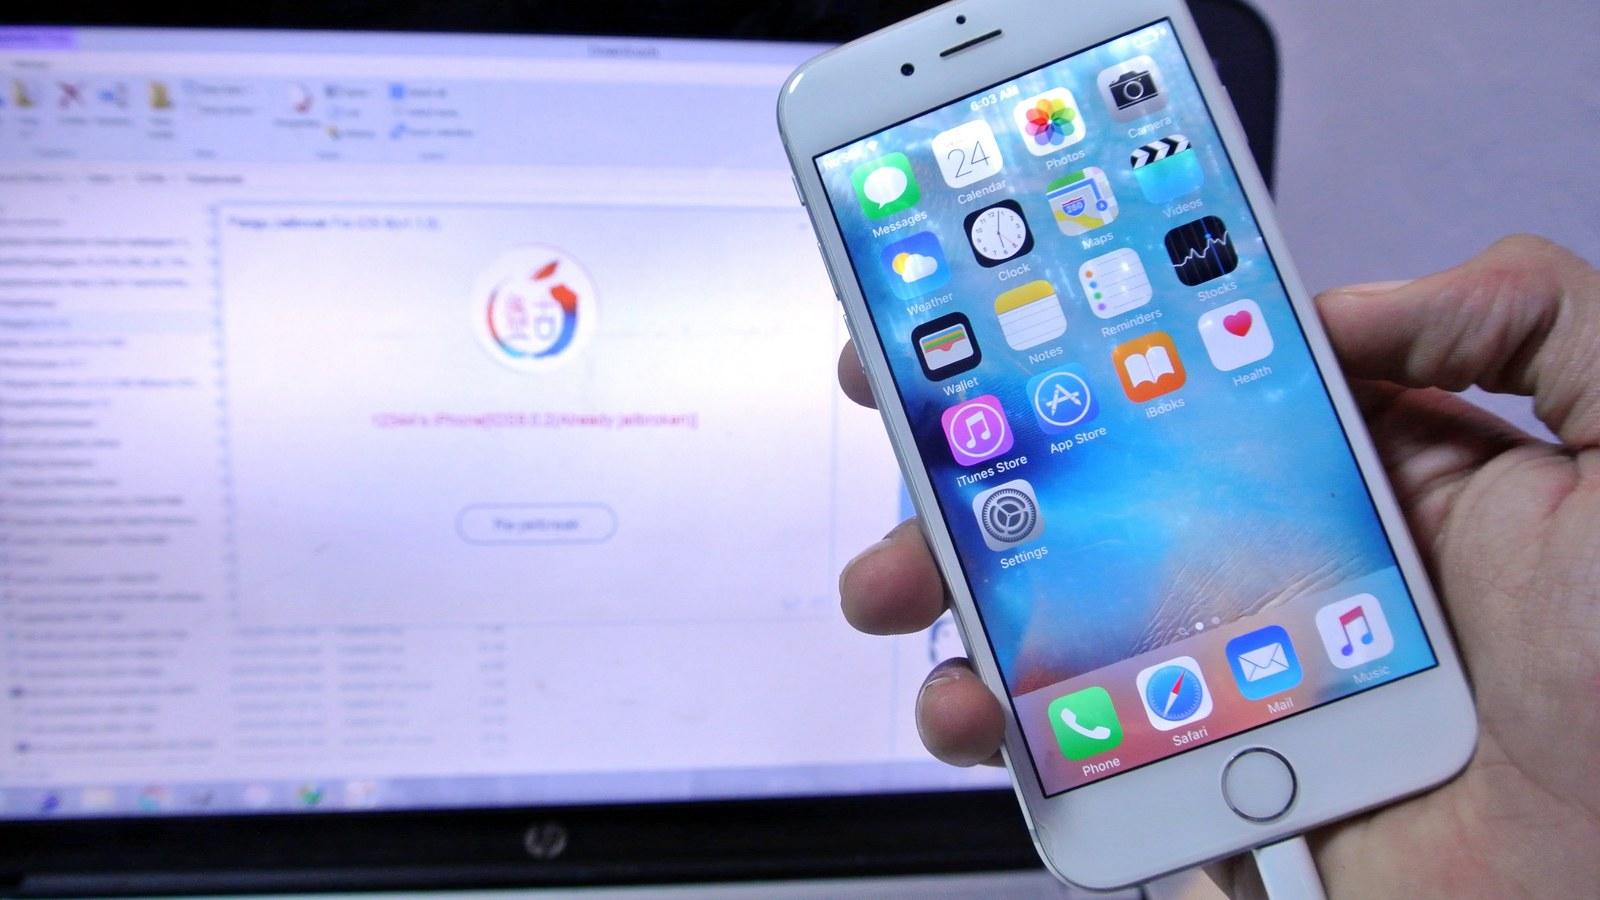 Apple has released public beta versions of iOS and OS X 9.3.2 El Capitan 10.11.5